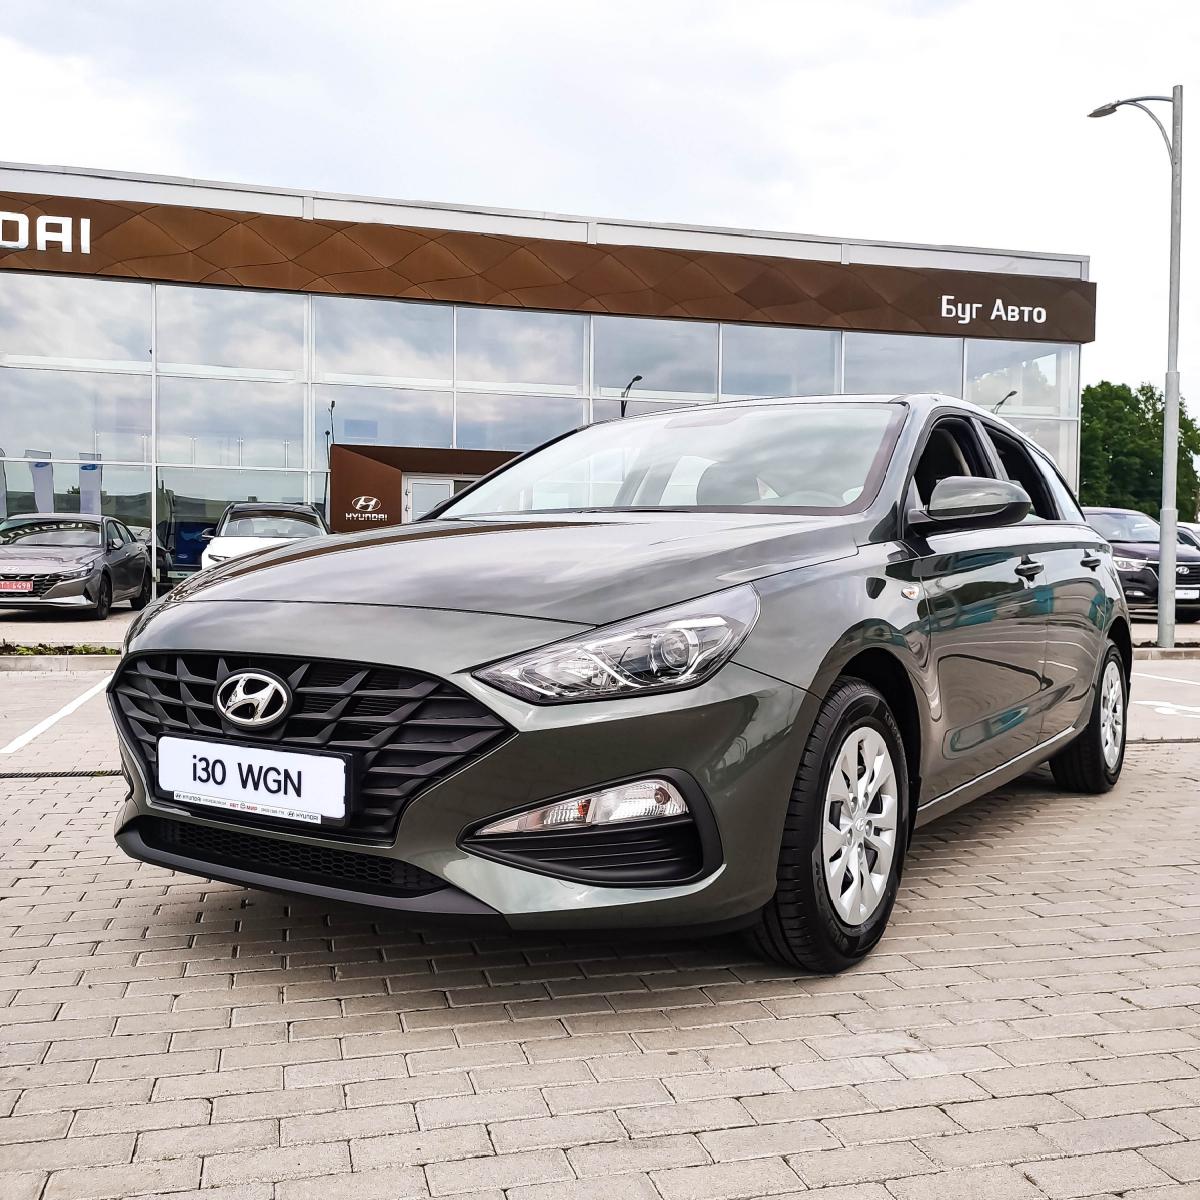 Спеціальна вигода на придбання Hyundai i30 WGN! | Хюндай Мотор Україна - фото 9